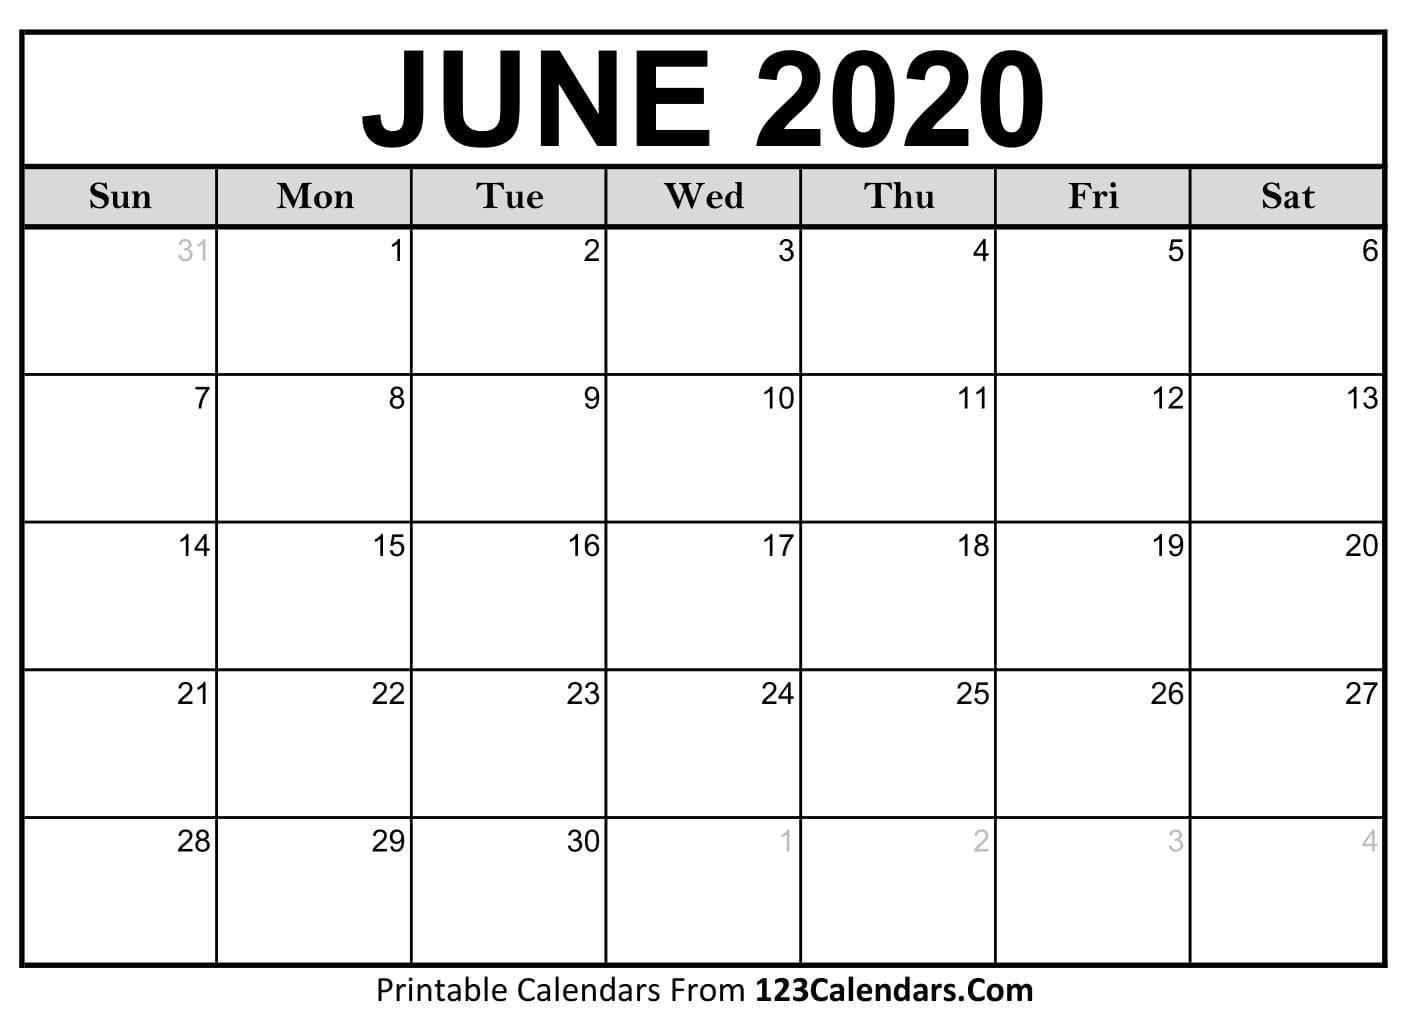 June 2020 Printable Calendar | 123Calendars Printable Month Calendar With Times